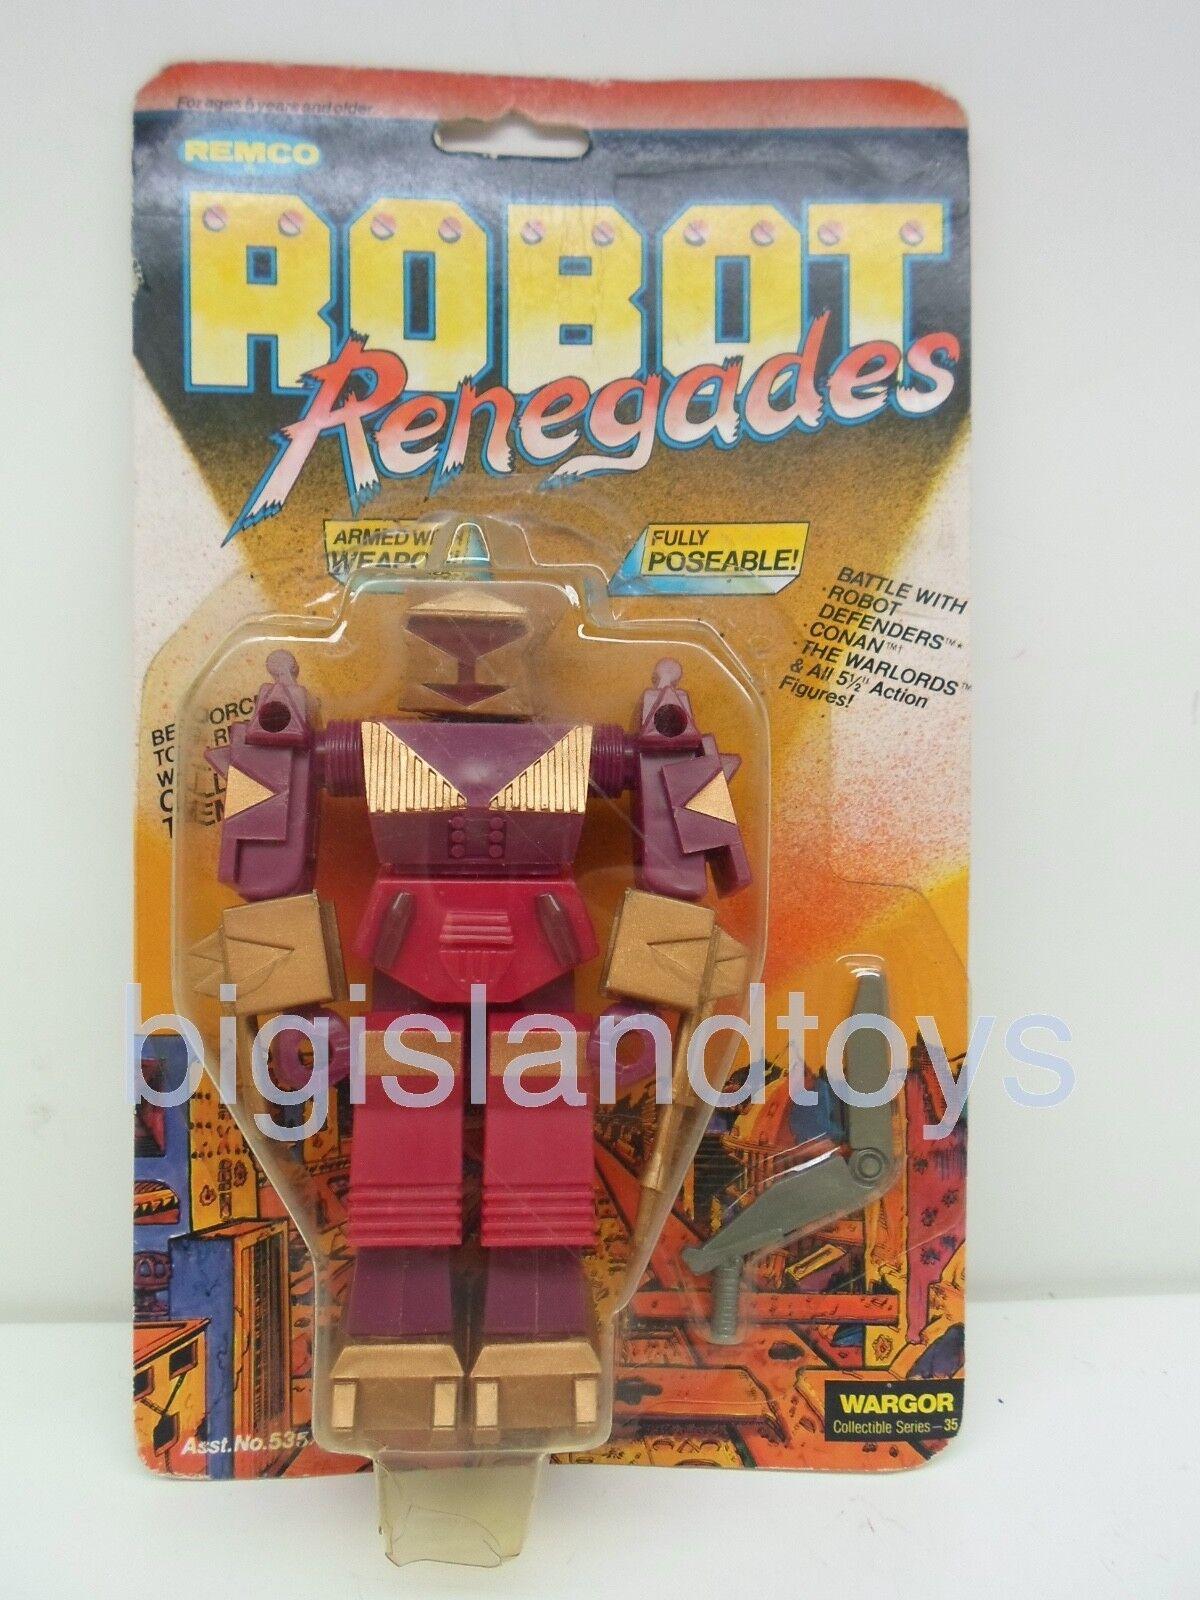 Robot Defenders & Renegades Remco 1982 Wargor Action Figure Sealed